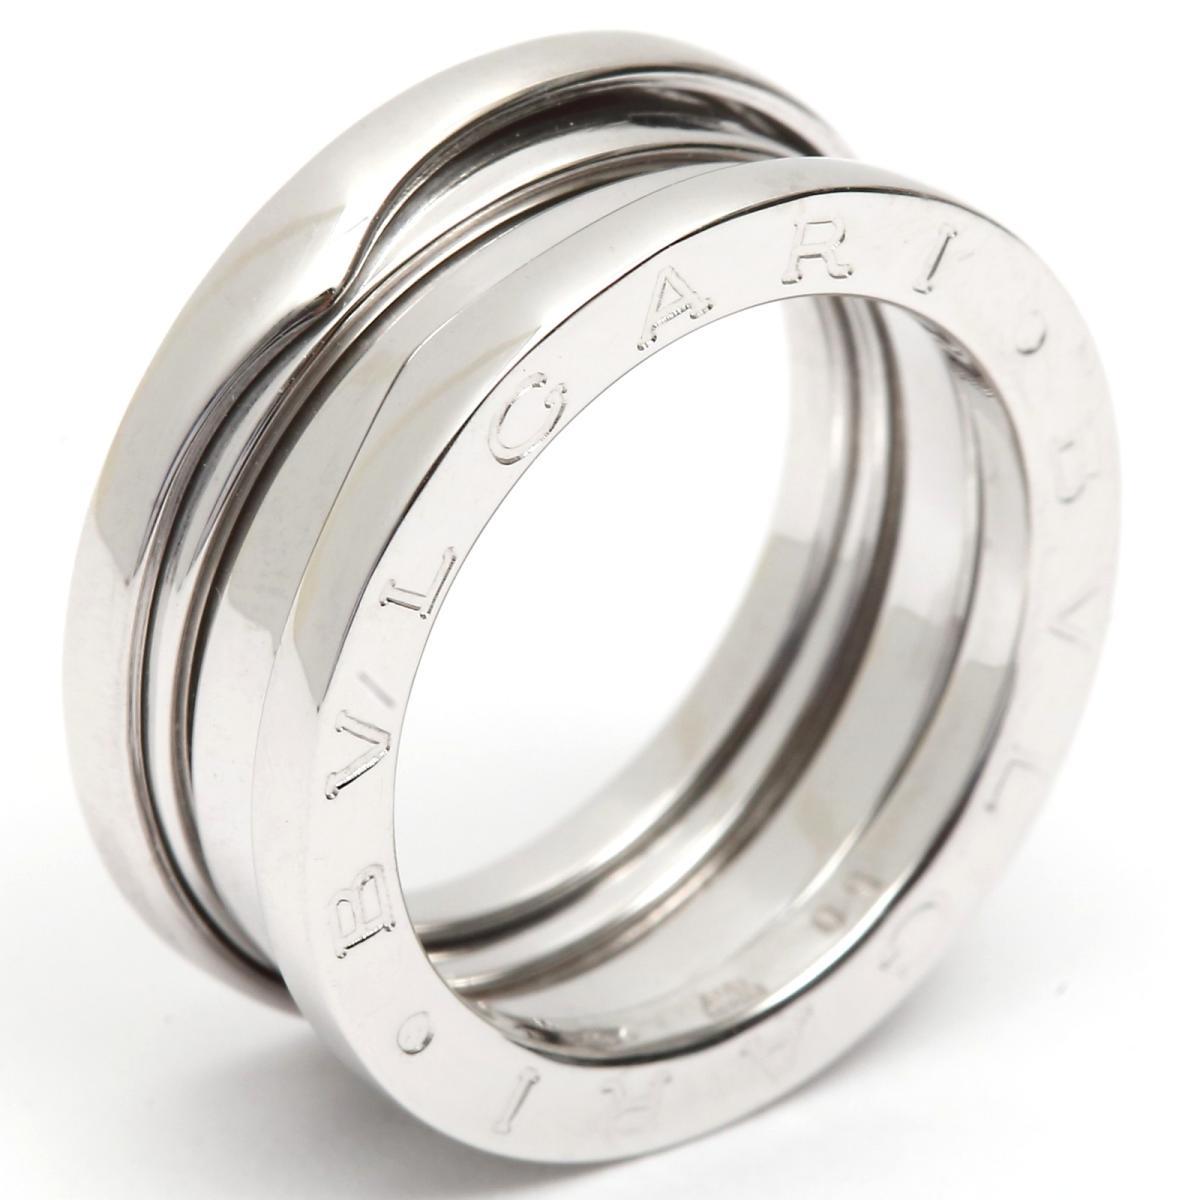 142acf1a4d36 楽天市場】ブルガリ B-zero1 リング Sサイズ ビーゼロワン 指輪 ブランド ...